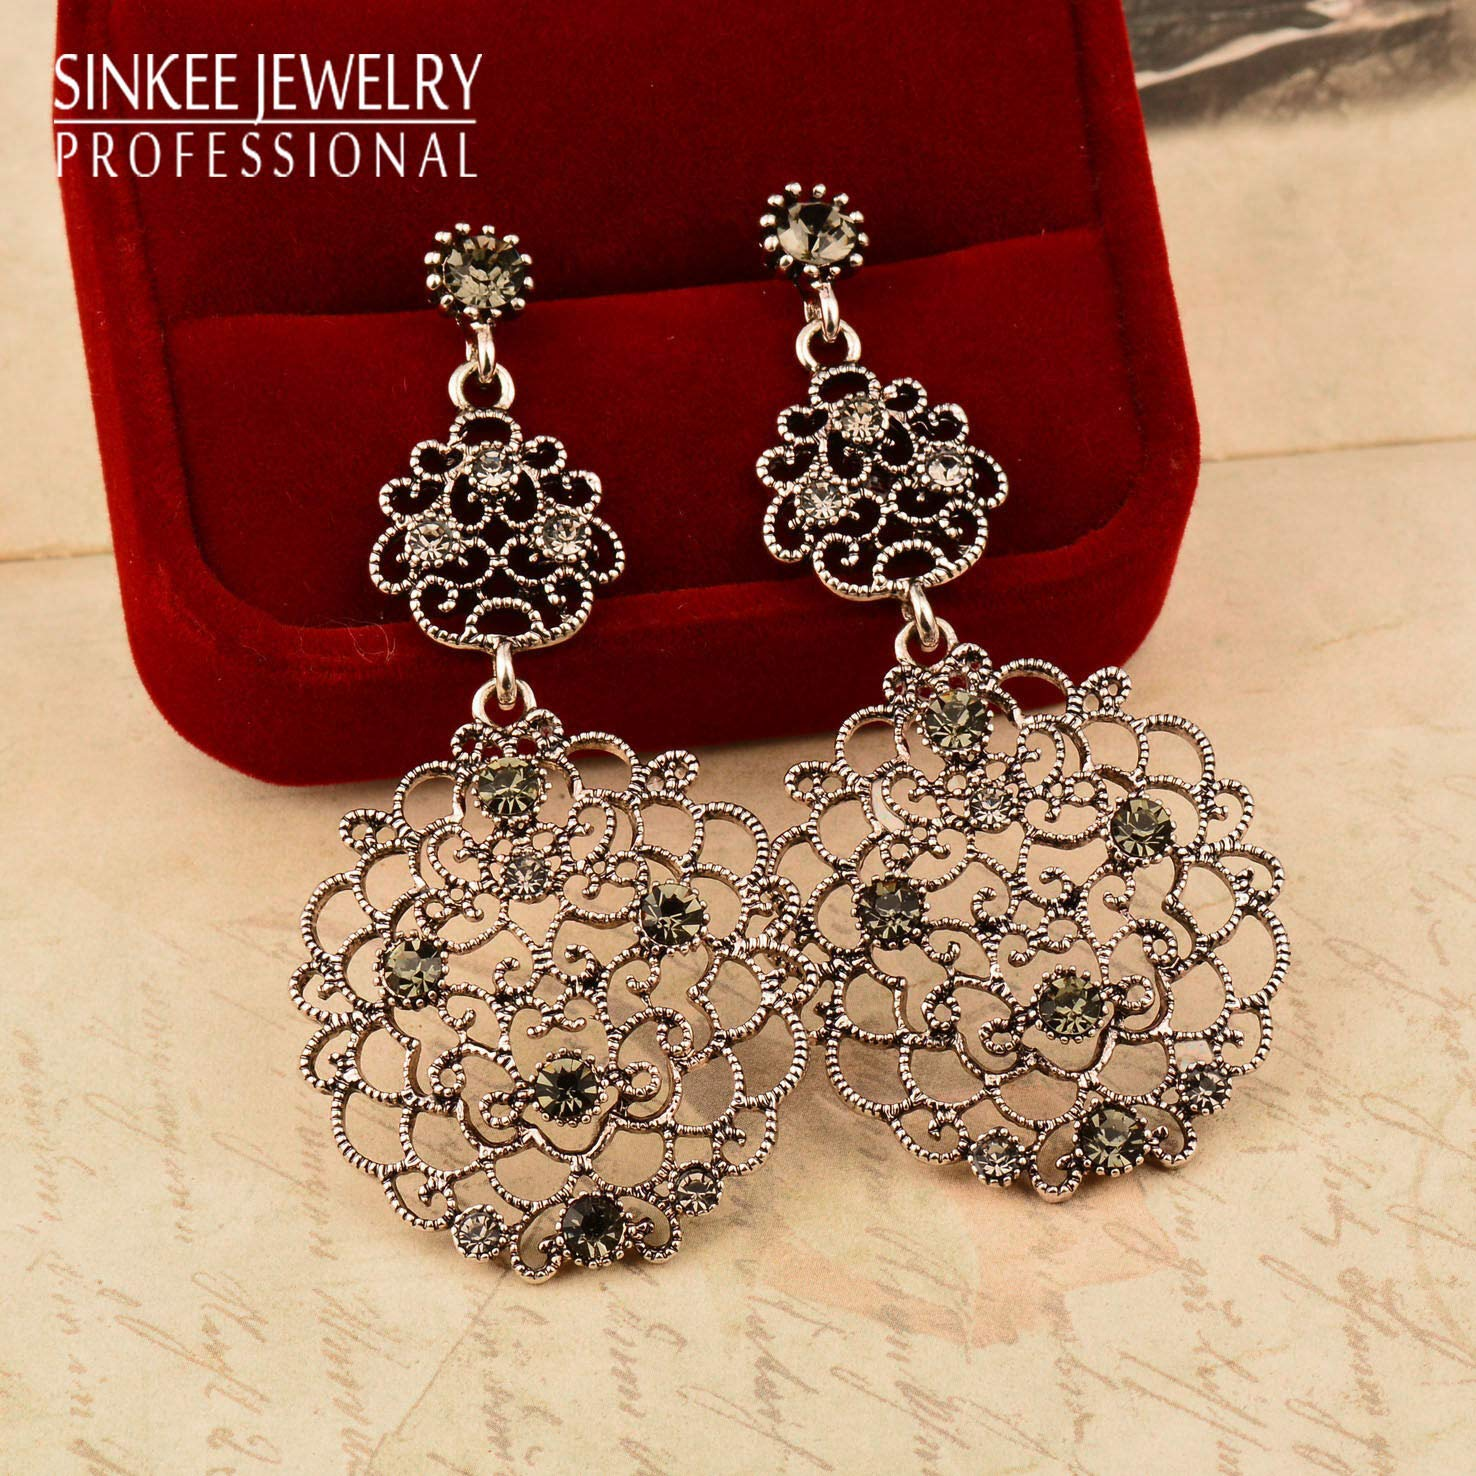 JENNIE SHOP Luxury Vintage Gray Cubic Zircon Big Earrings Women Antique Silver Plated ES701